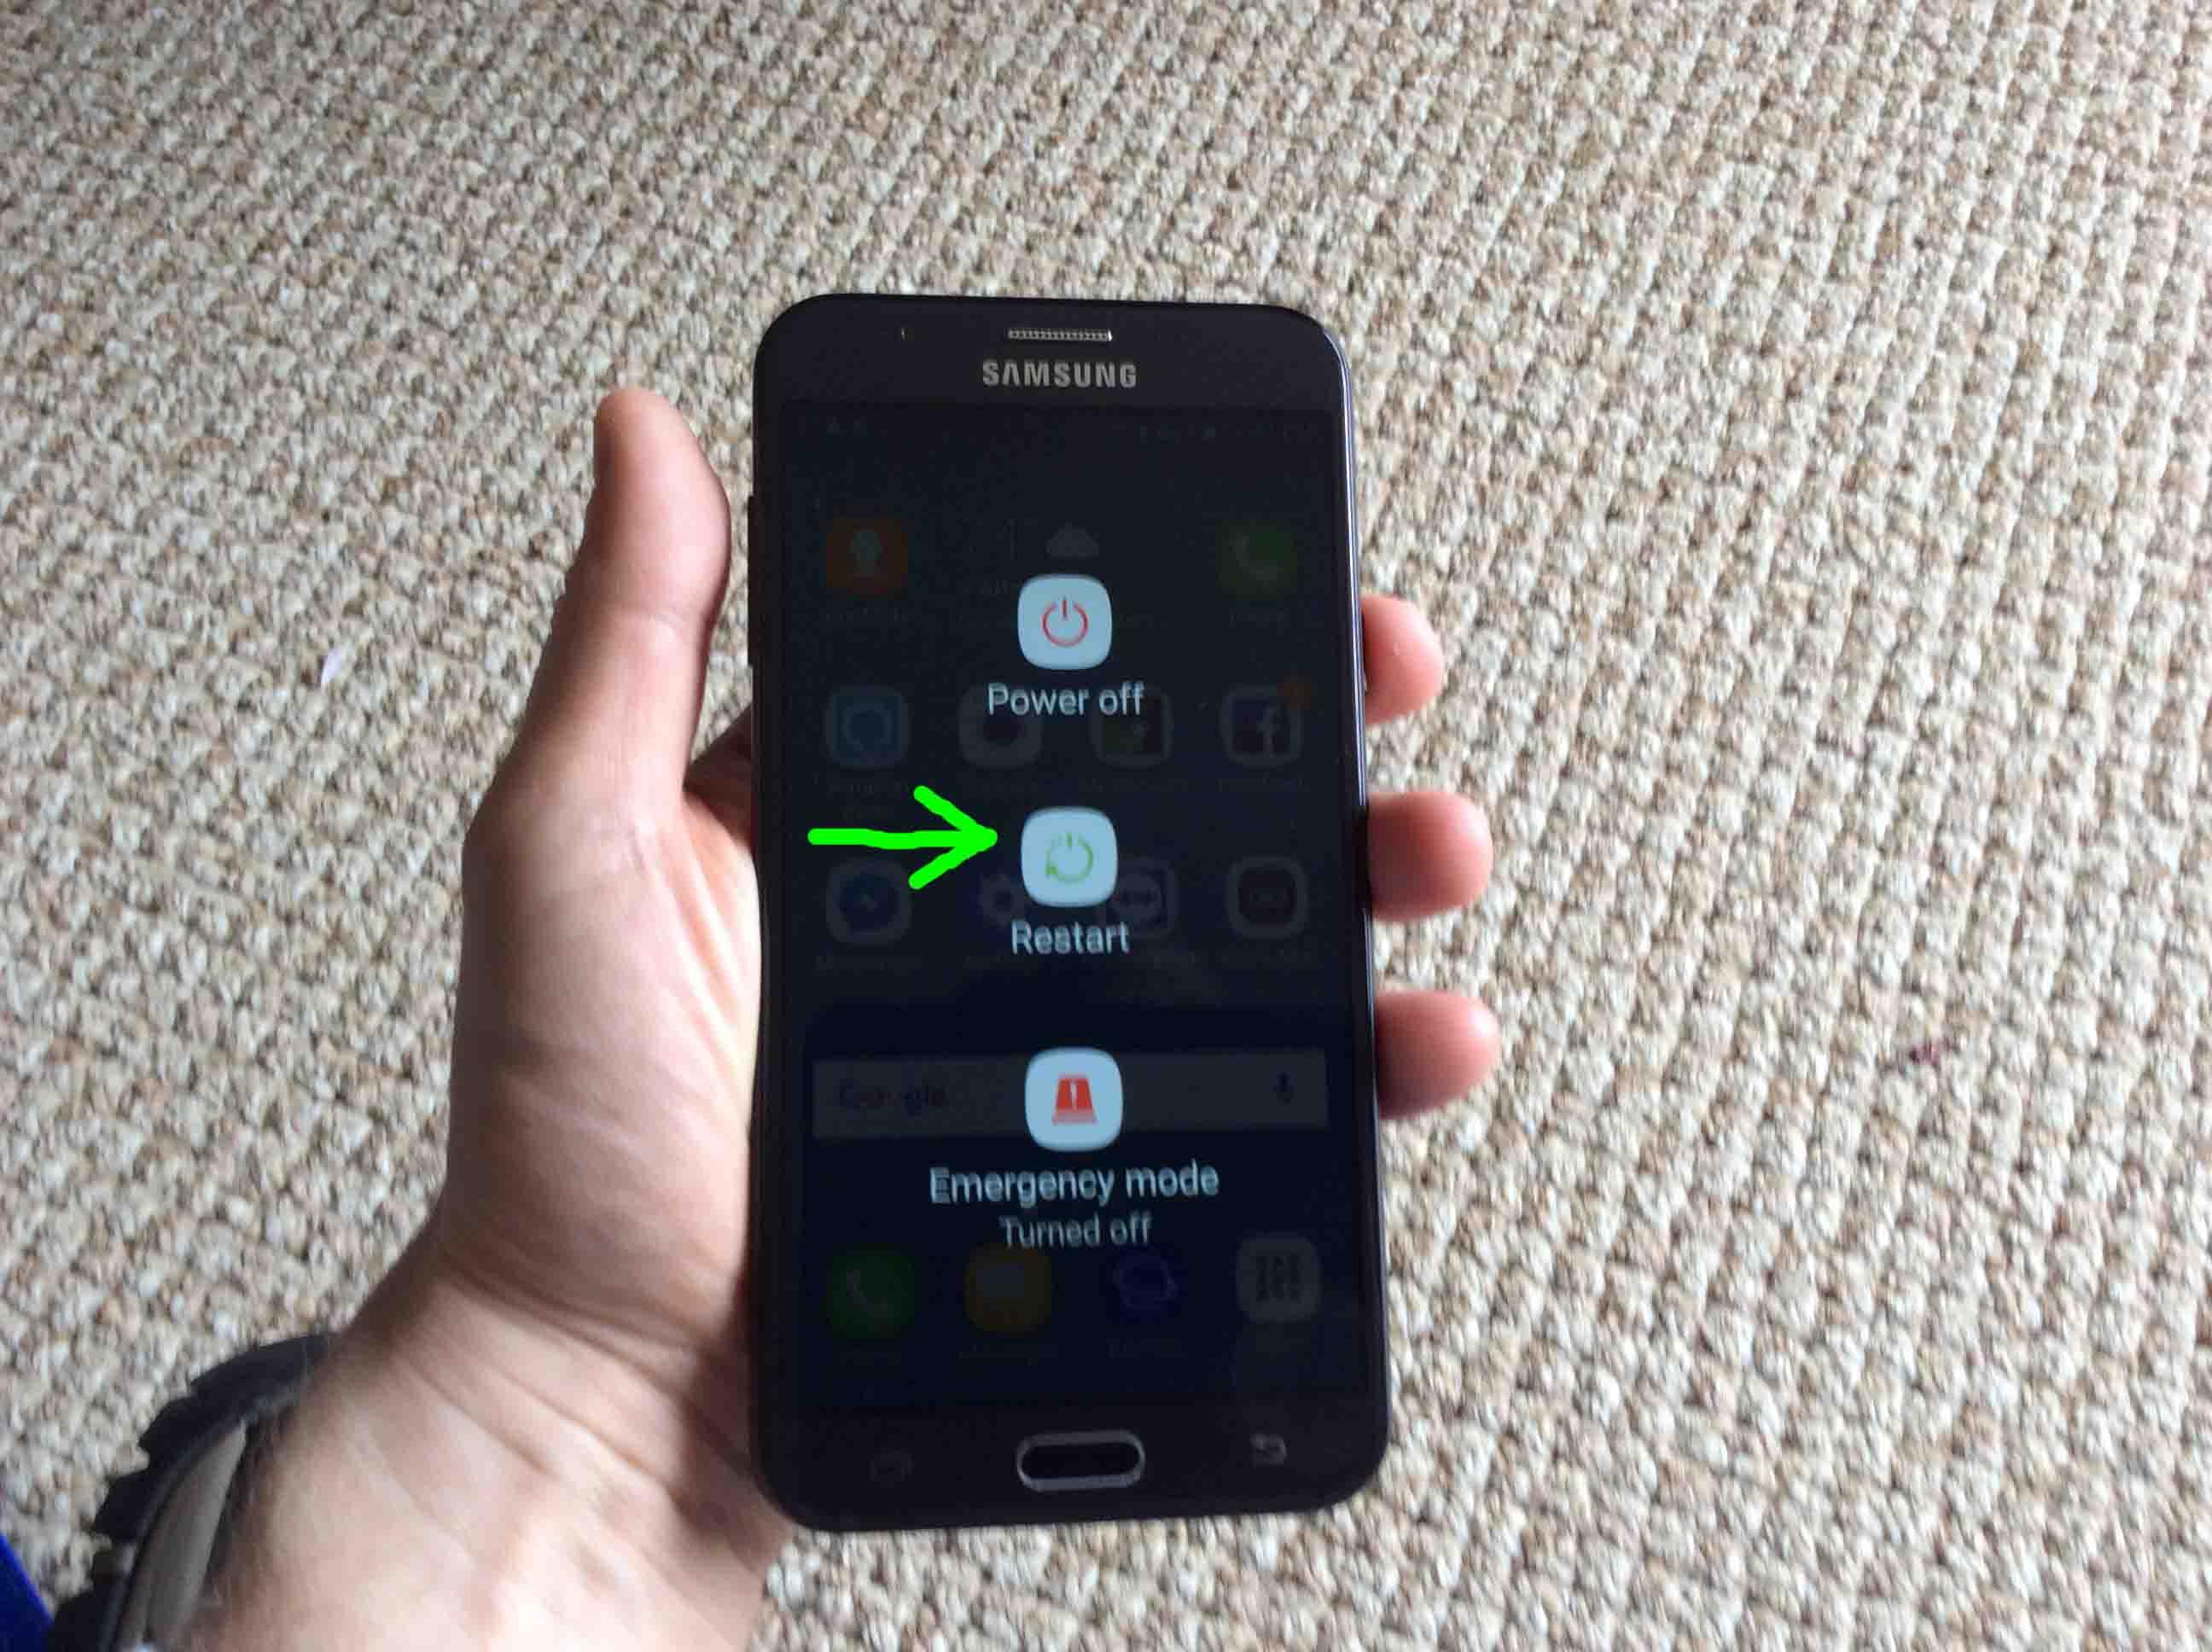 Samsung J7 Force Restart Instructions, How to Restart Phone ...